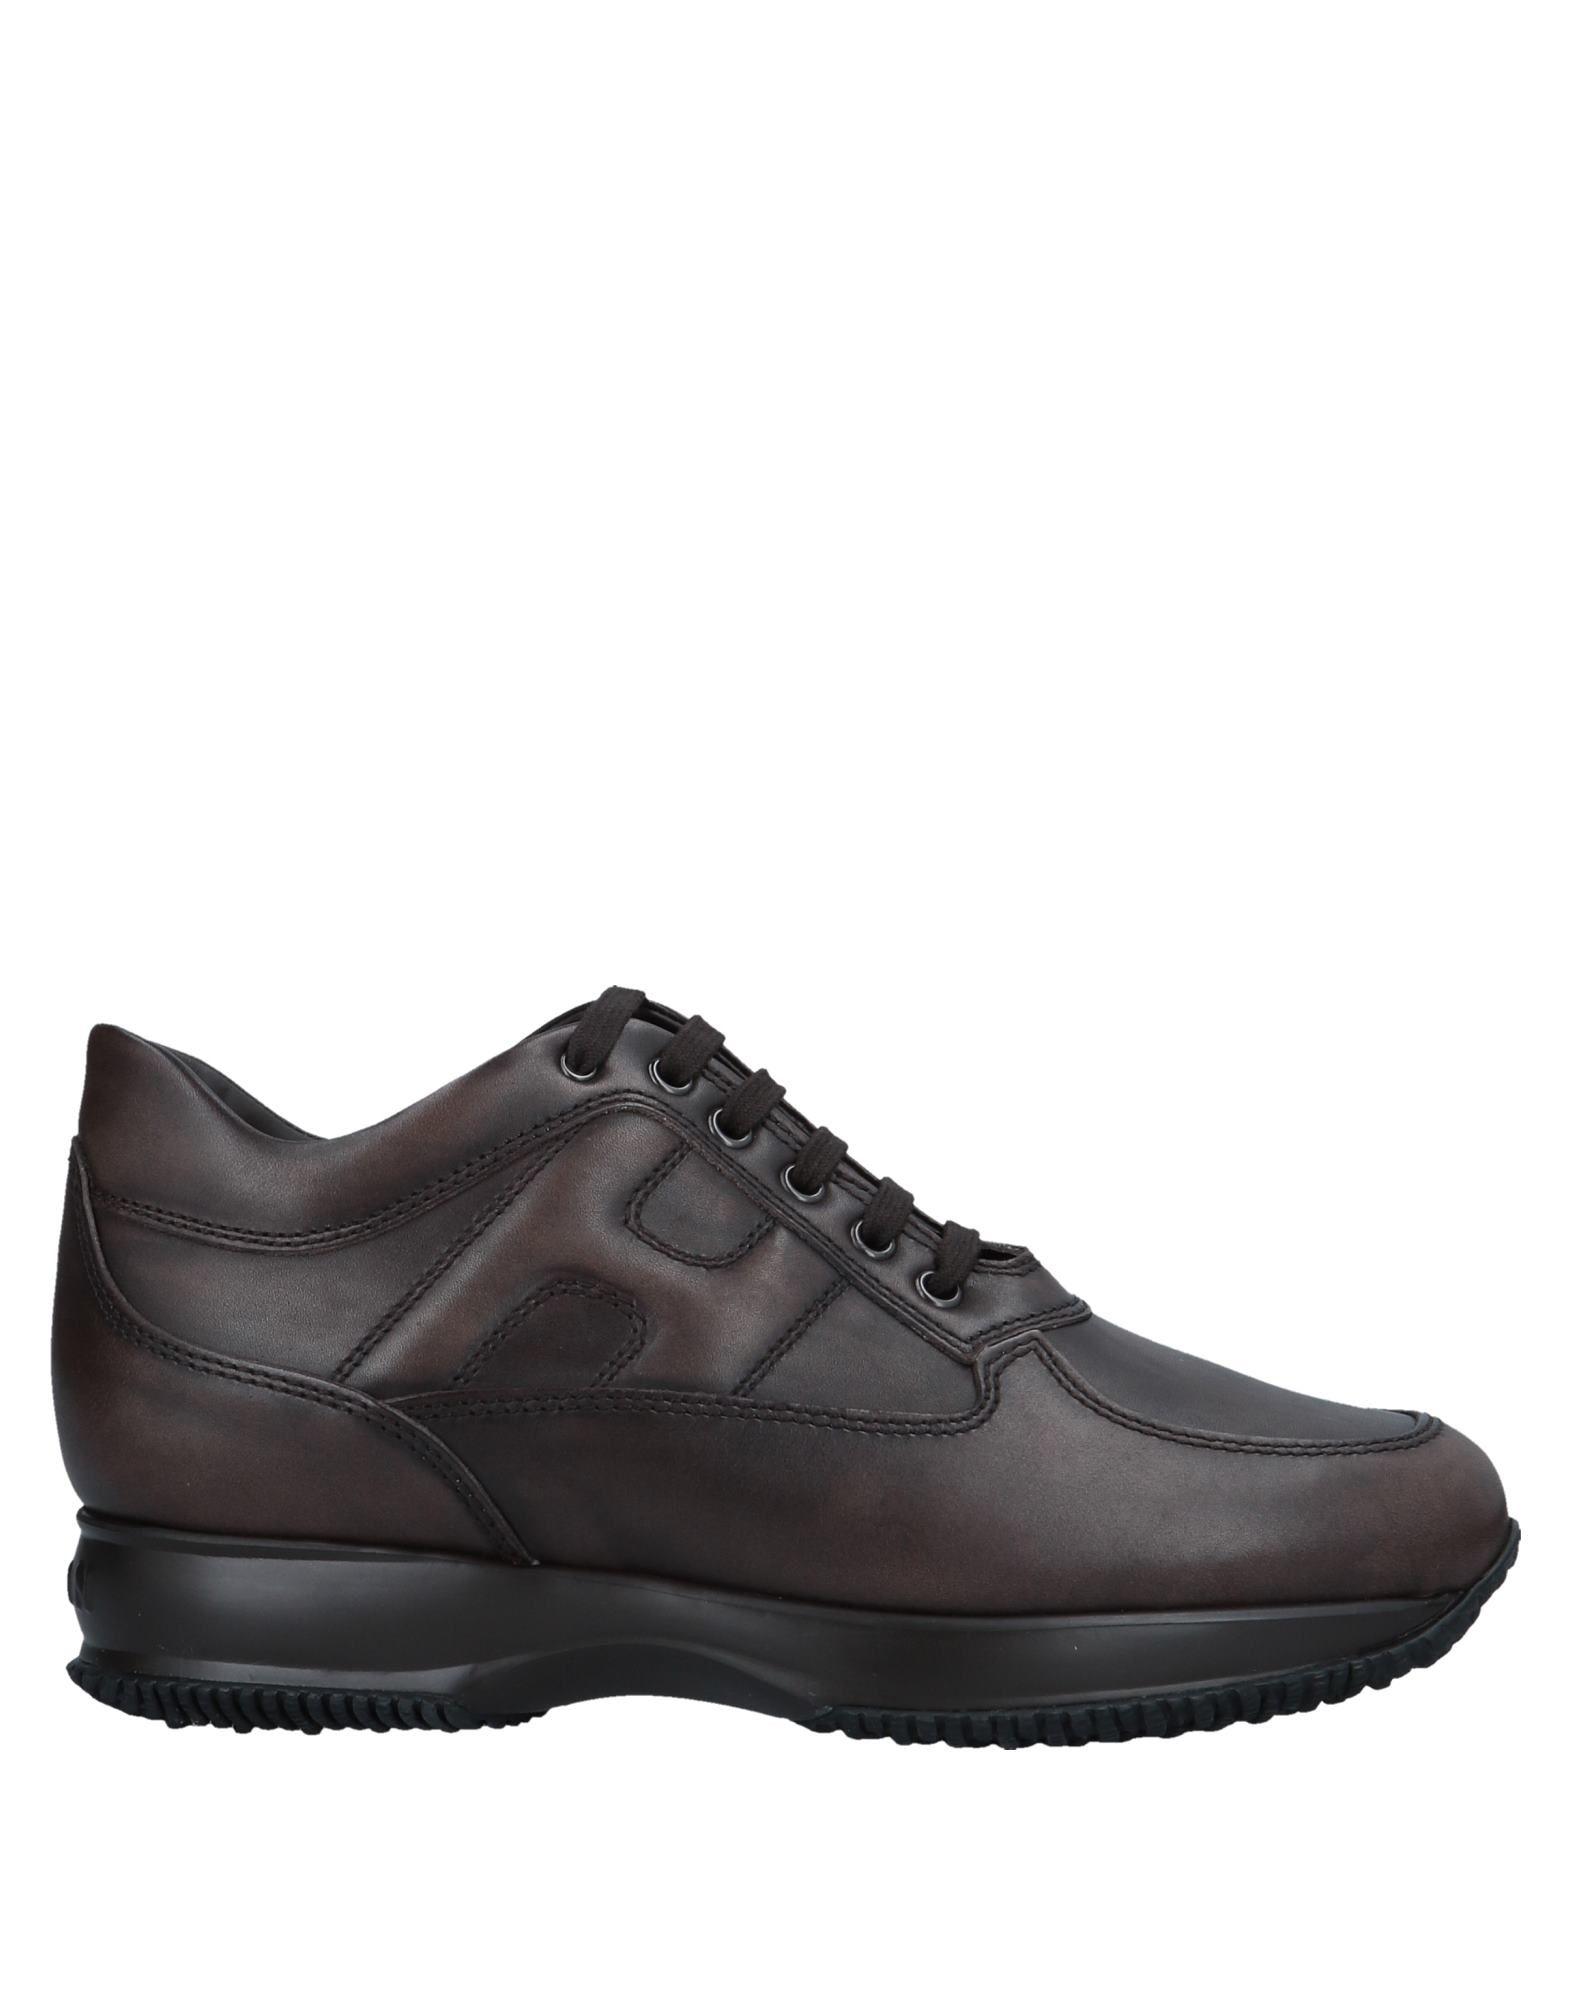 Hogan Sneakers Herren  11560593AK Gute Qualität beliebte Schuhe